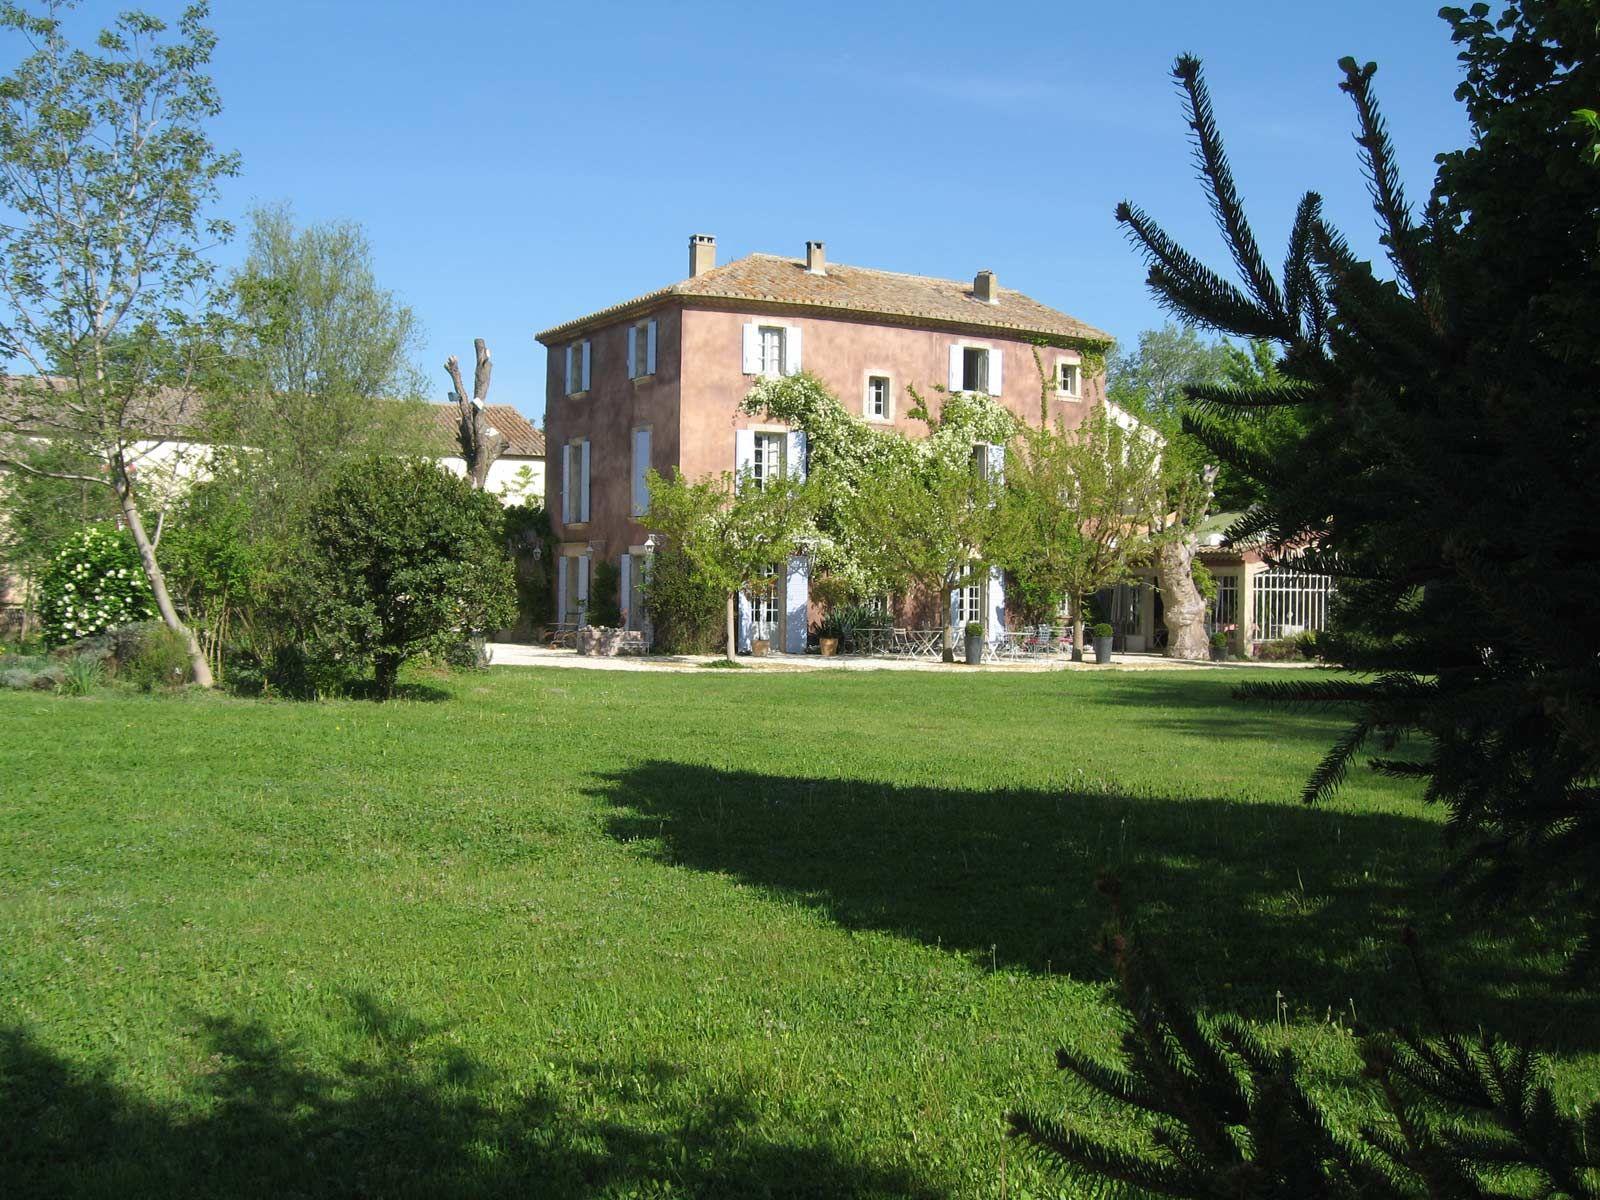 La Bastide Rose Maison D Hotes En Provence 84250 Le Thor France